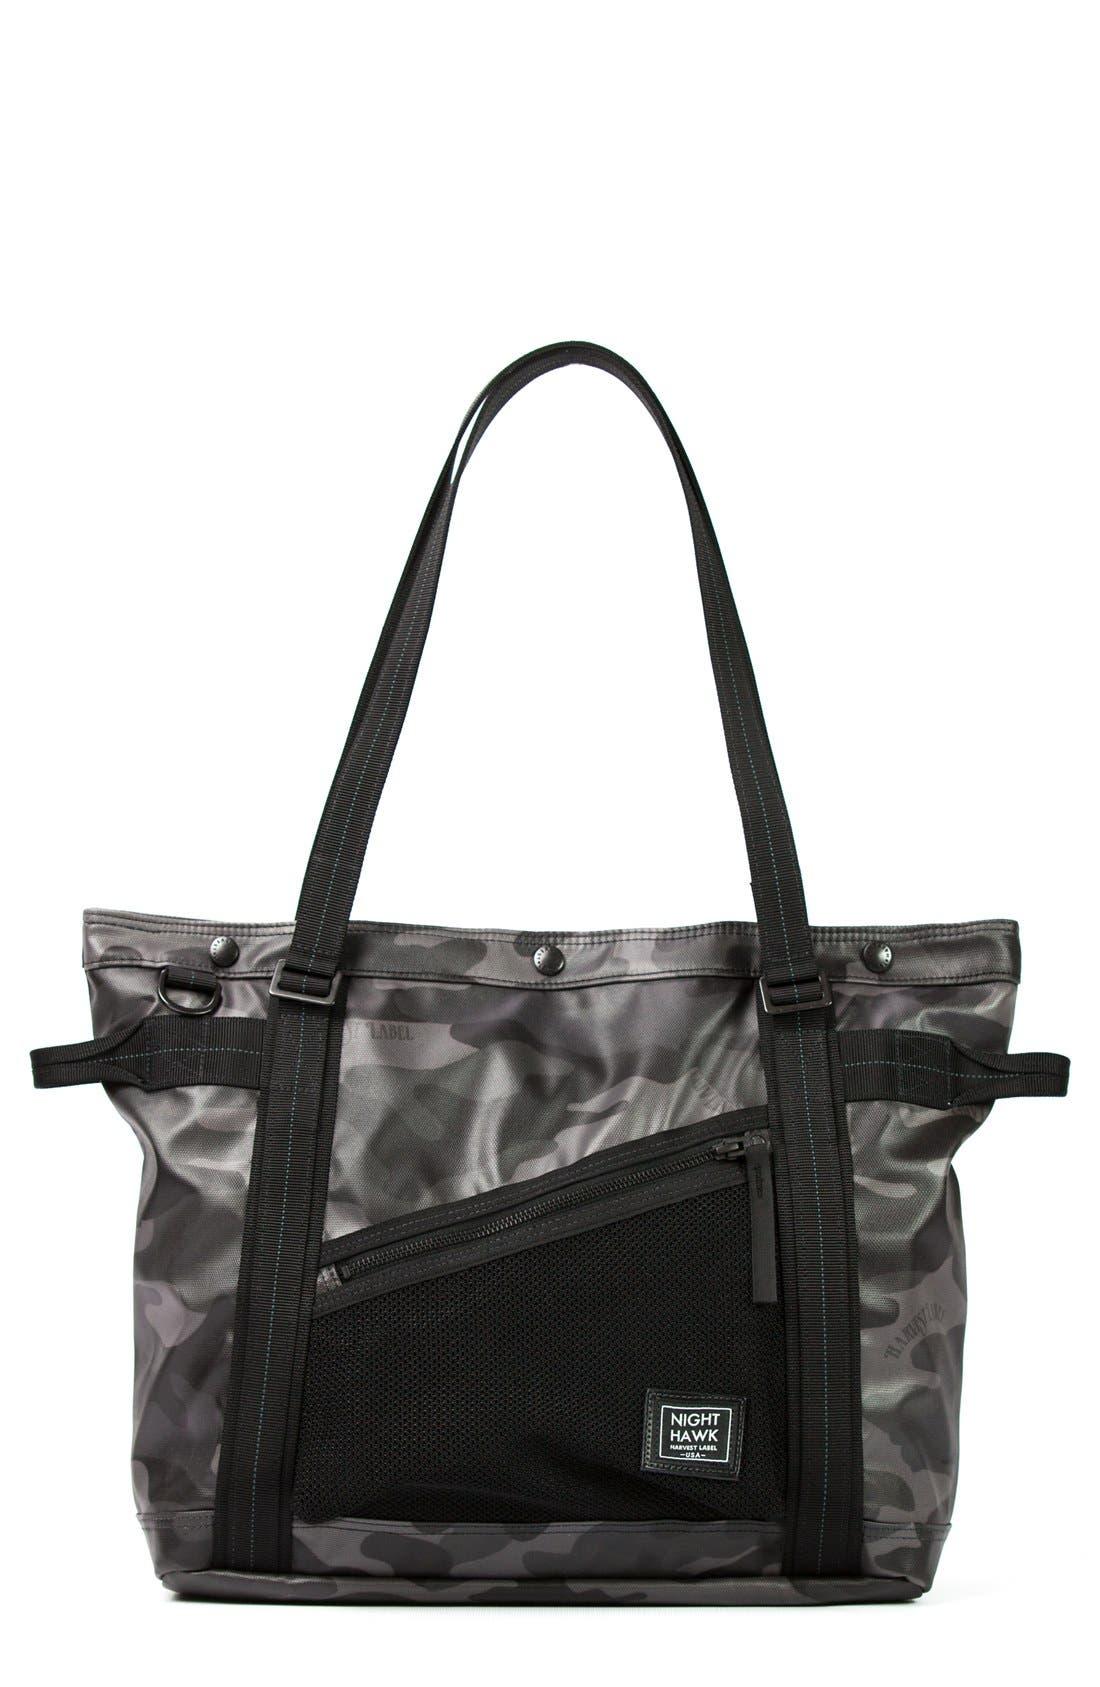 Main Image - Harvest Label 'NightHawk' Tote Bag